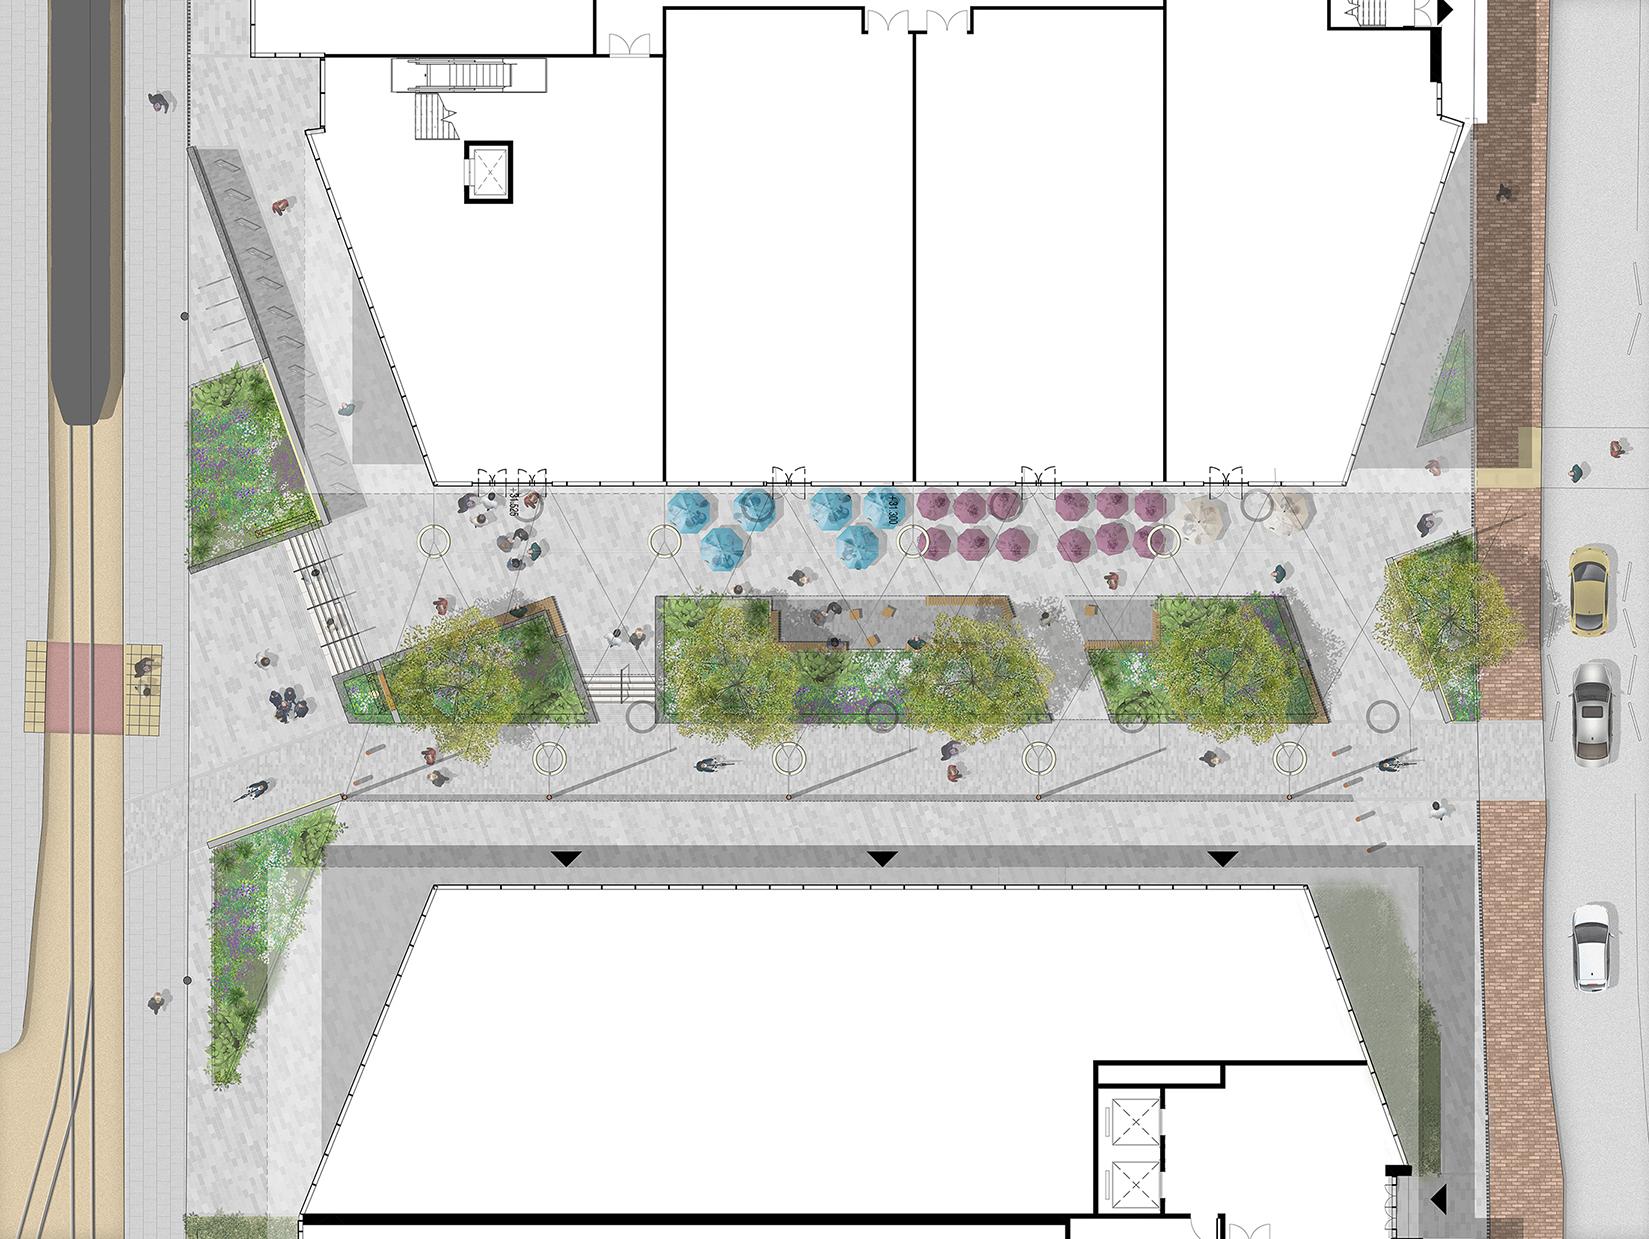 Public Realm Illustrative Plan LR